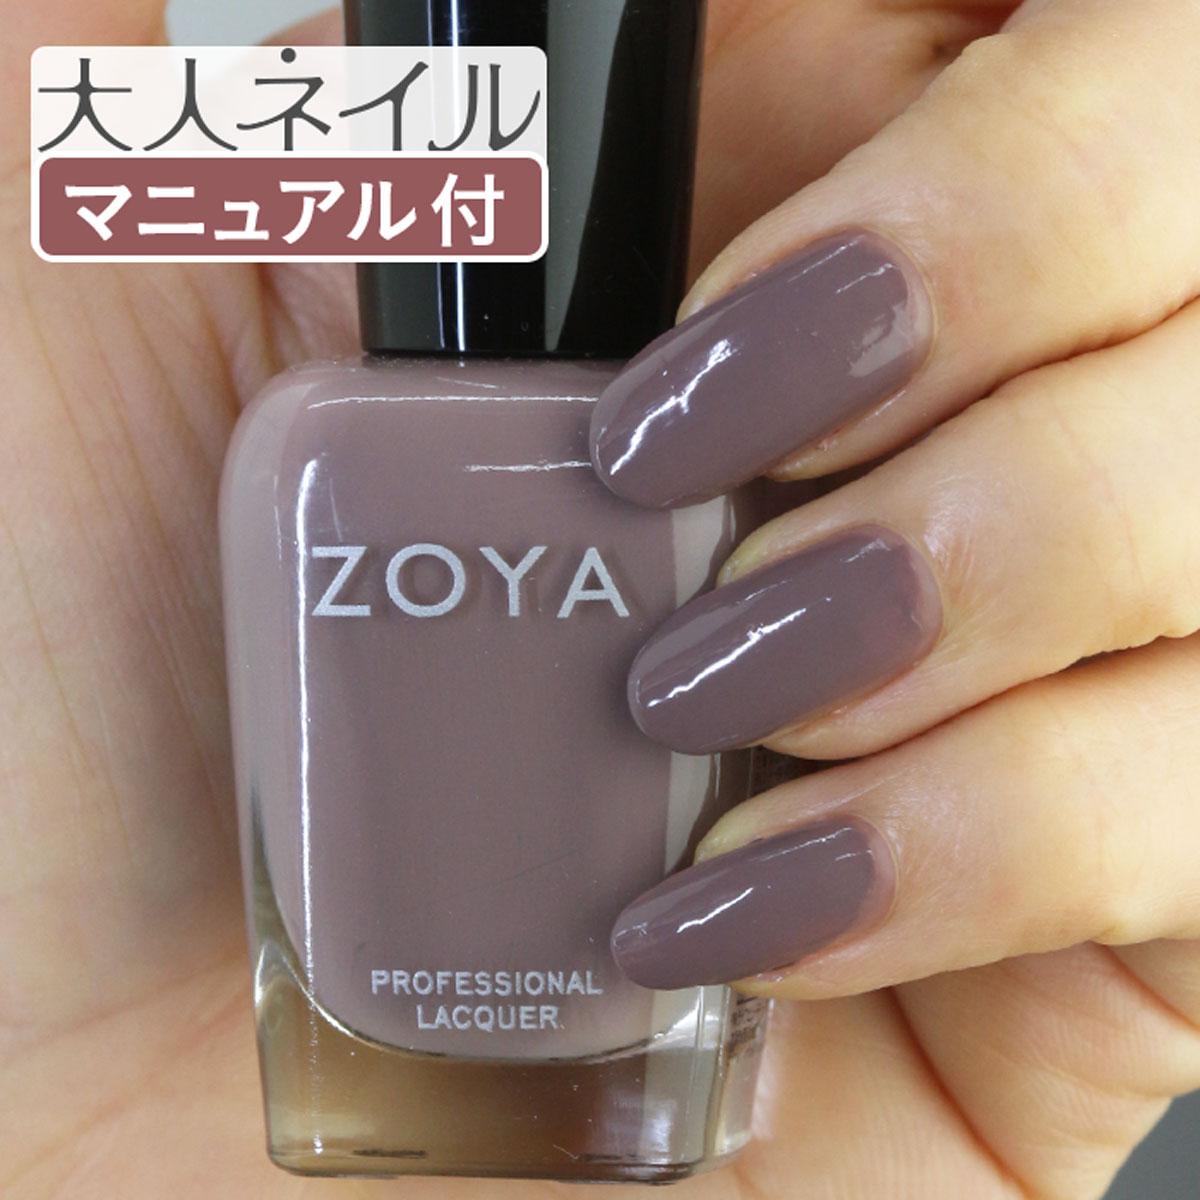 ZOYA ゾーヤ ゾヤ ネイルカラー ZP564 15mL JANA ジャナー 自爪 の為に作られた ネイル にやさしい 自然派 マニキュア zoya セルフネイル にもおすすめ ブラウングレー